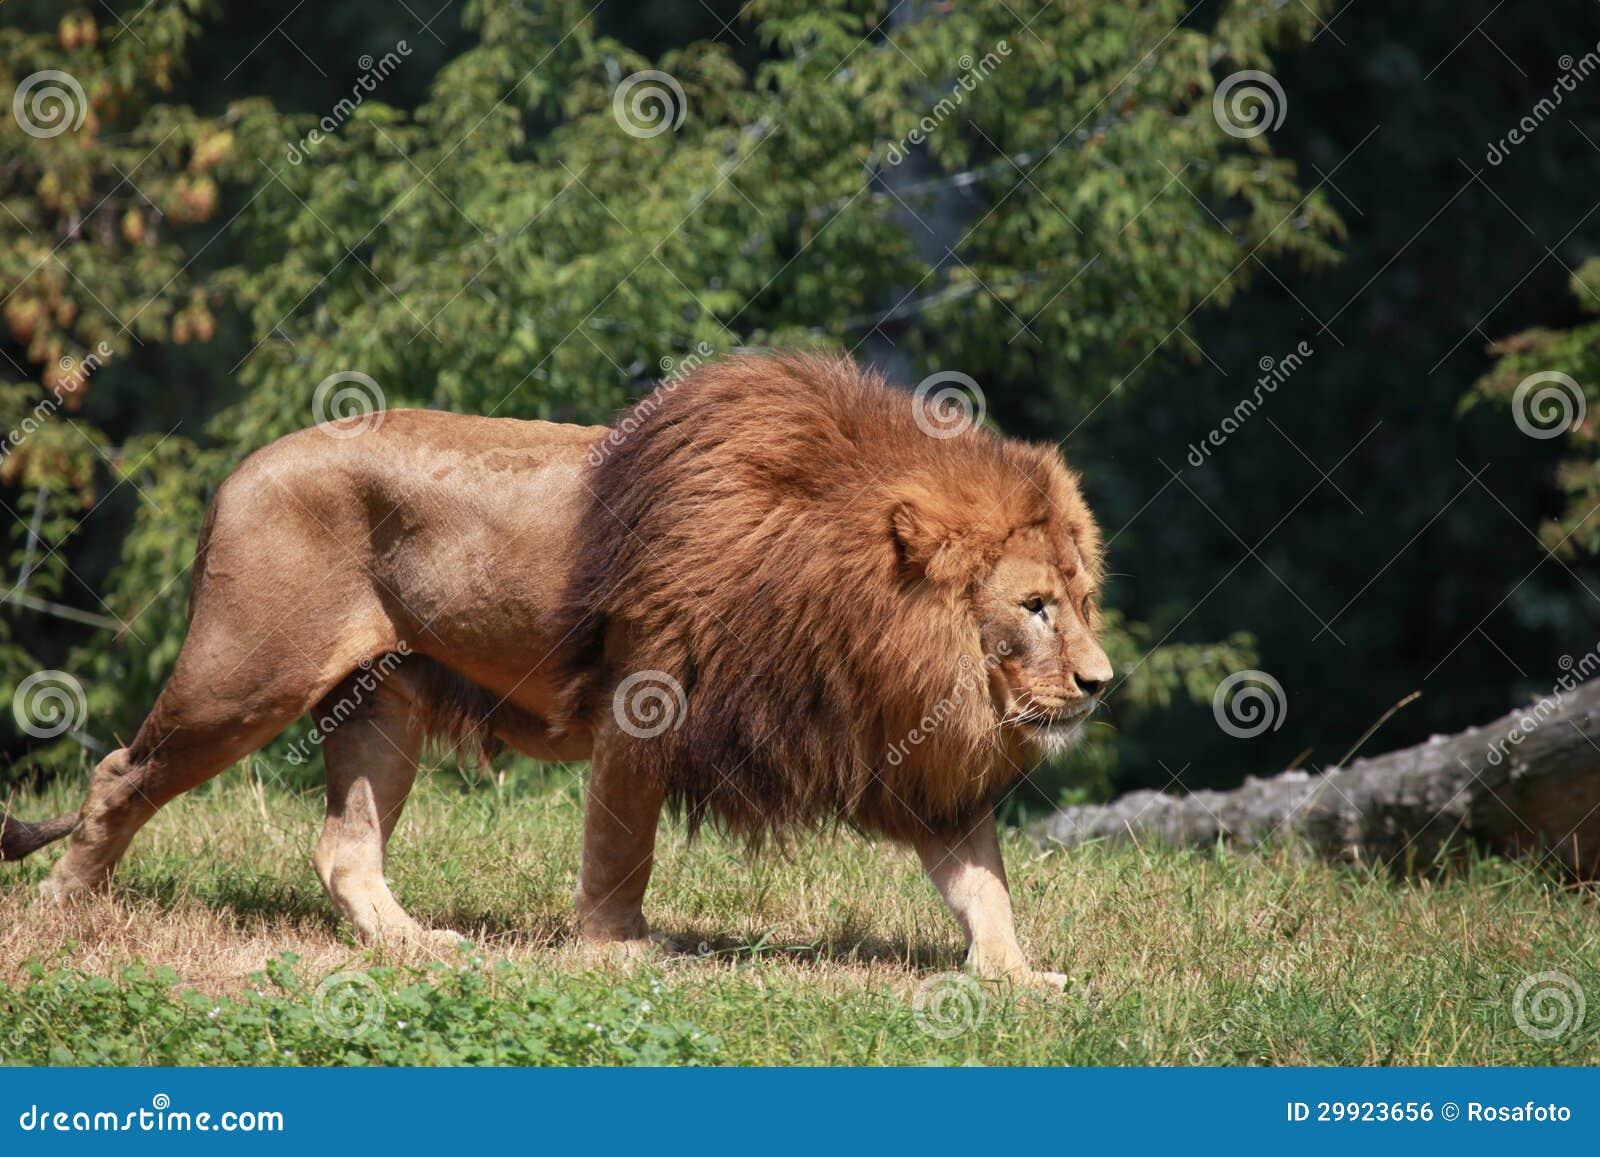 lion walking in zoo enclosure royalty free stock image